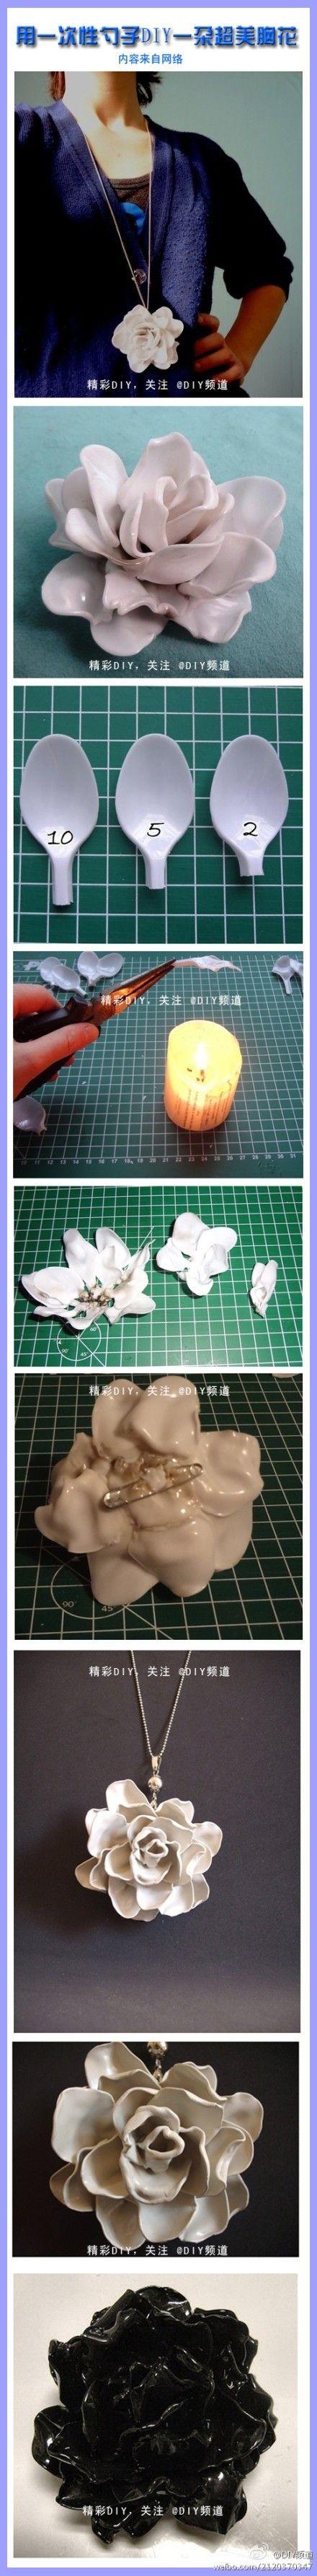 Plastic spoon flower